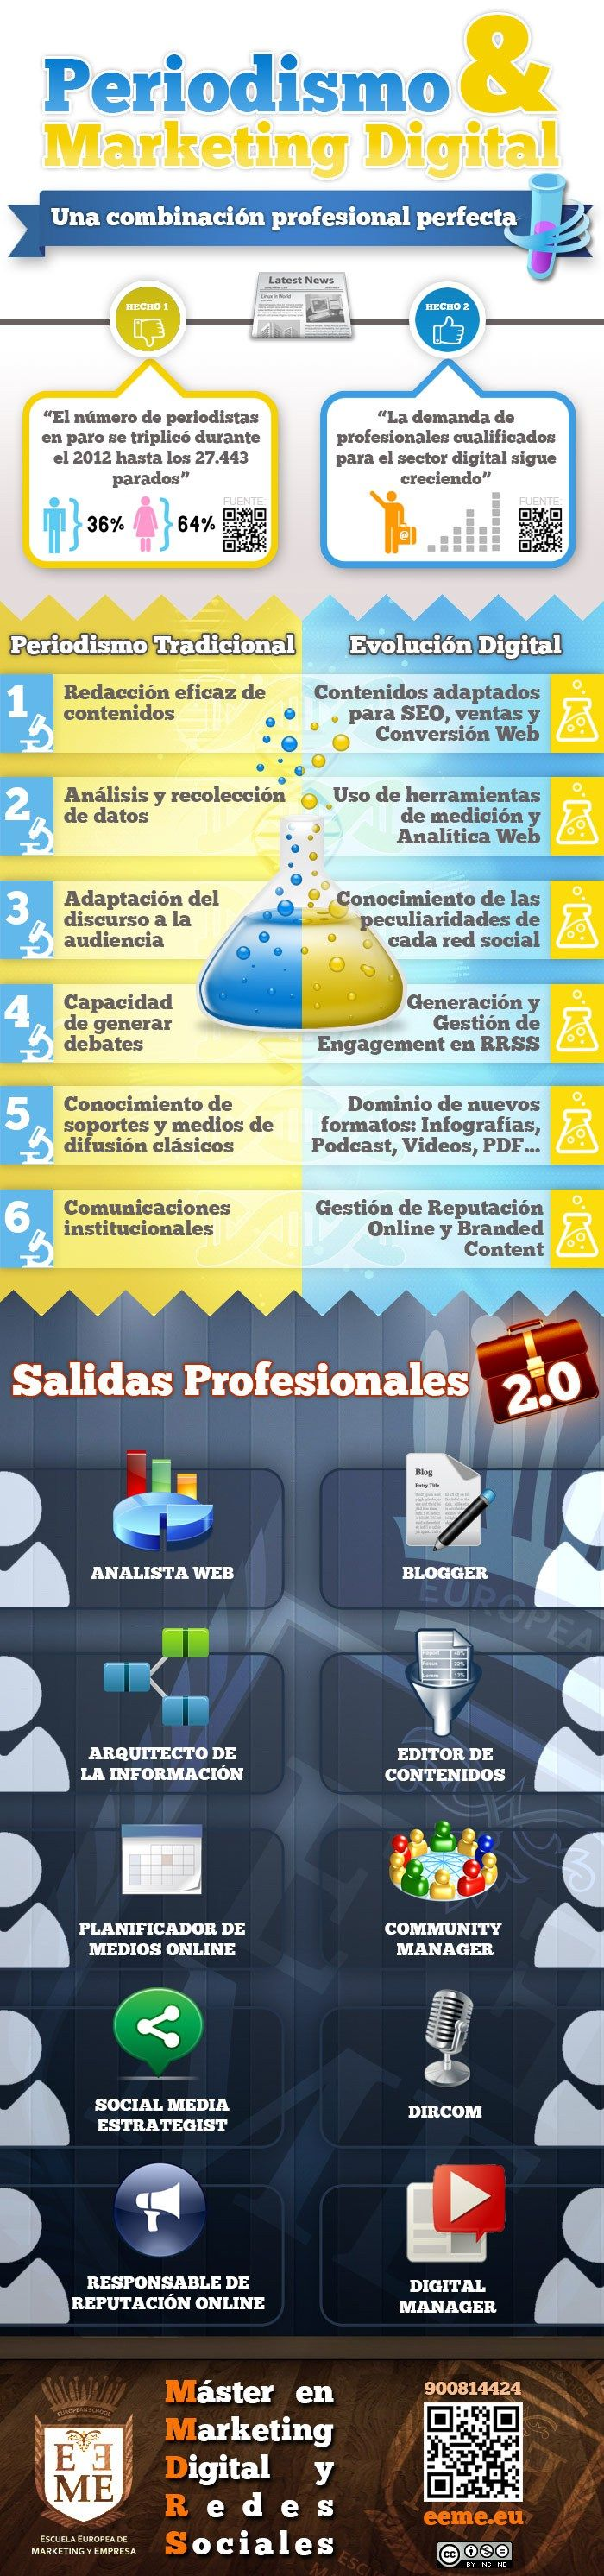 Periodismo y marketing digital #infografia #infographic #socialmedia #marketing